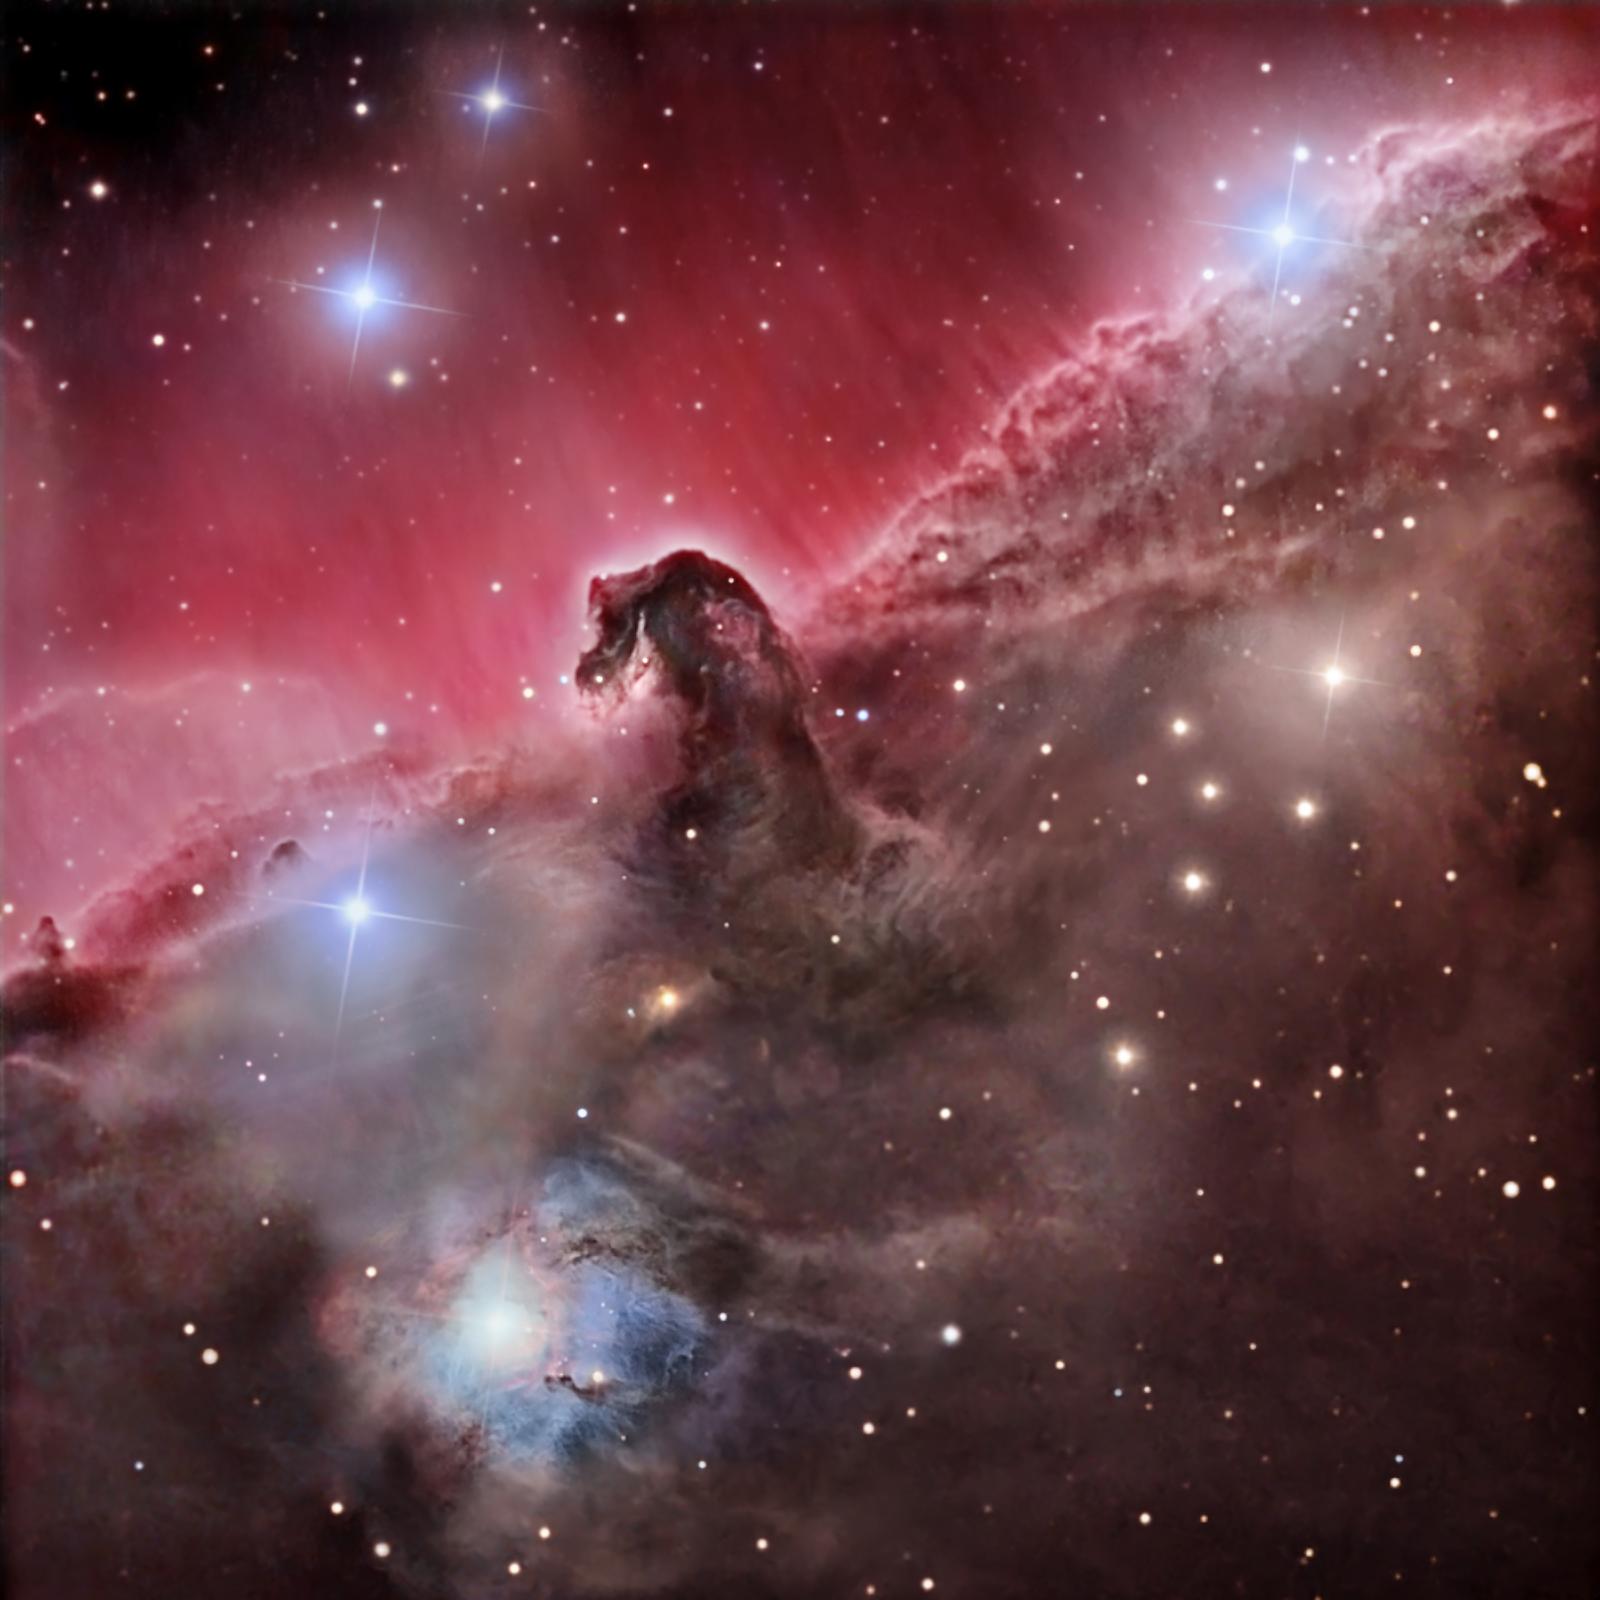 Good   Wallpaper Horse Nebula - Horsehead-Nebula-Wallpaper-HD-23  You Should Have_152118.jpg